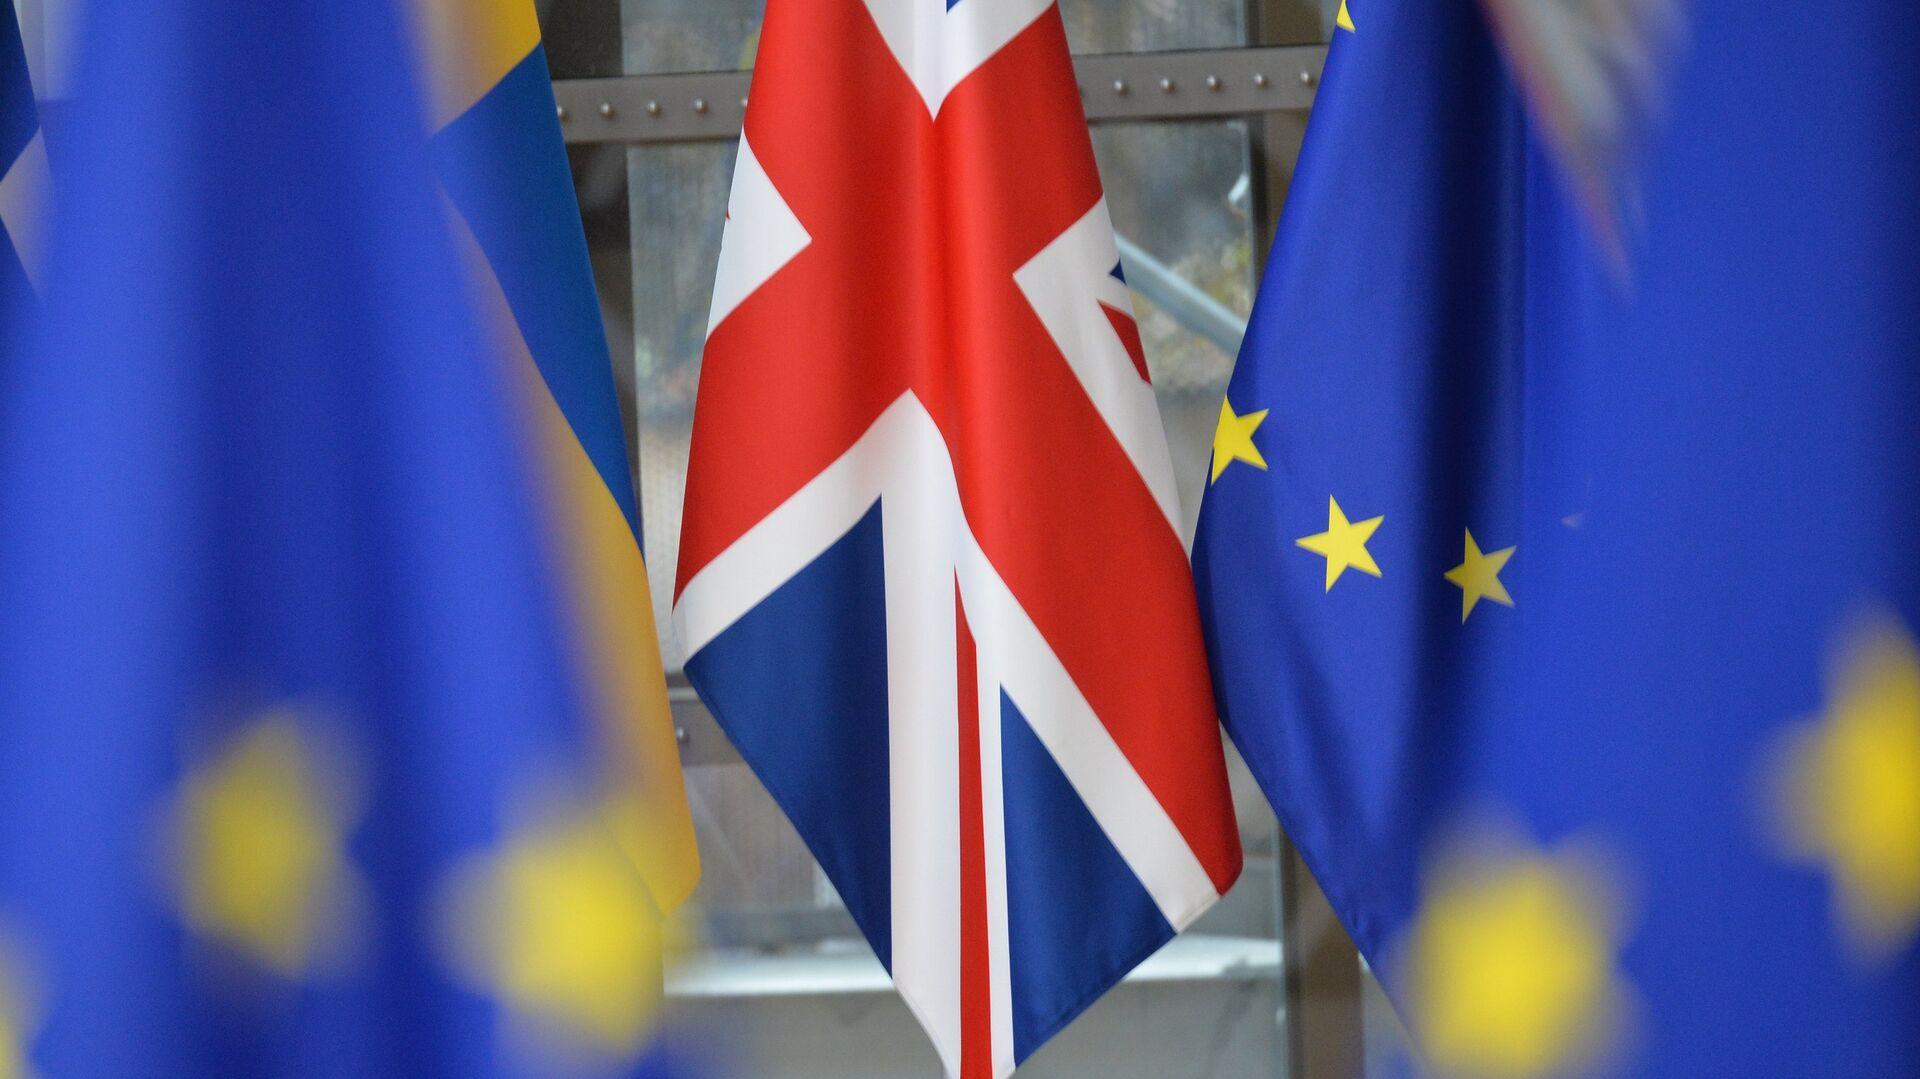 Флаг Великобритании на саммите ЕС в Брюсселе - РИА Новости, 1920, 17.09.2021